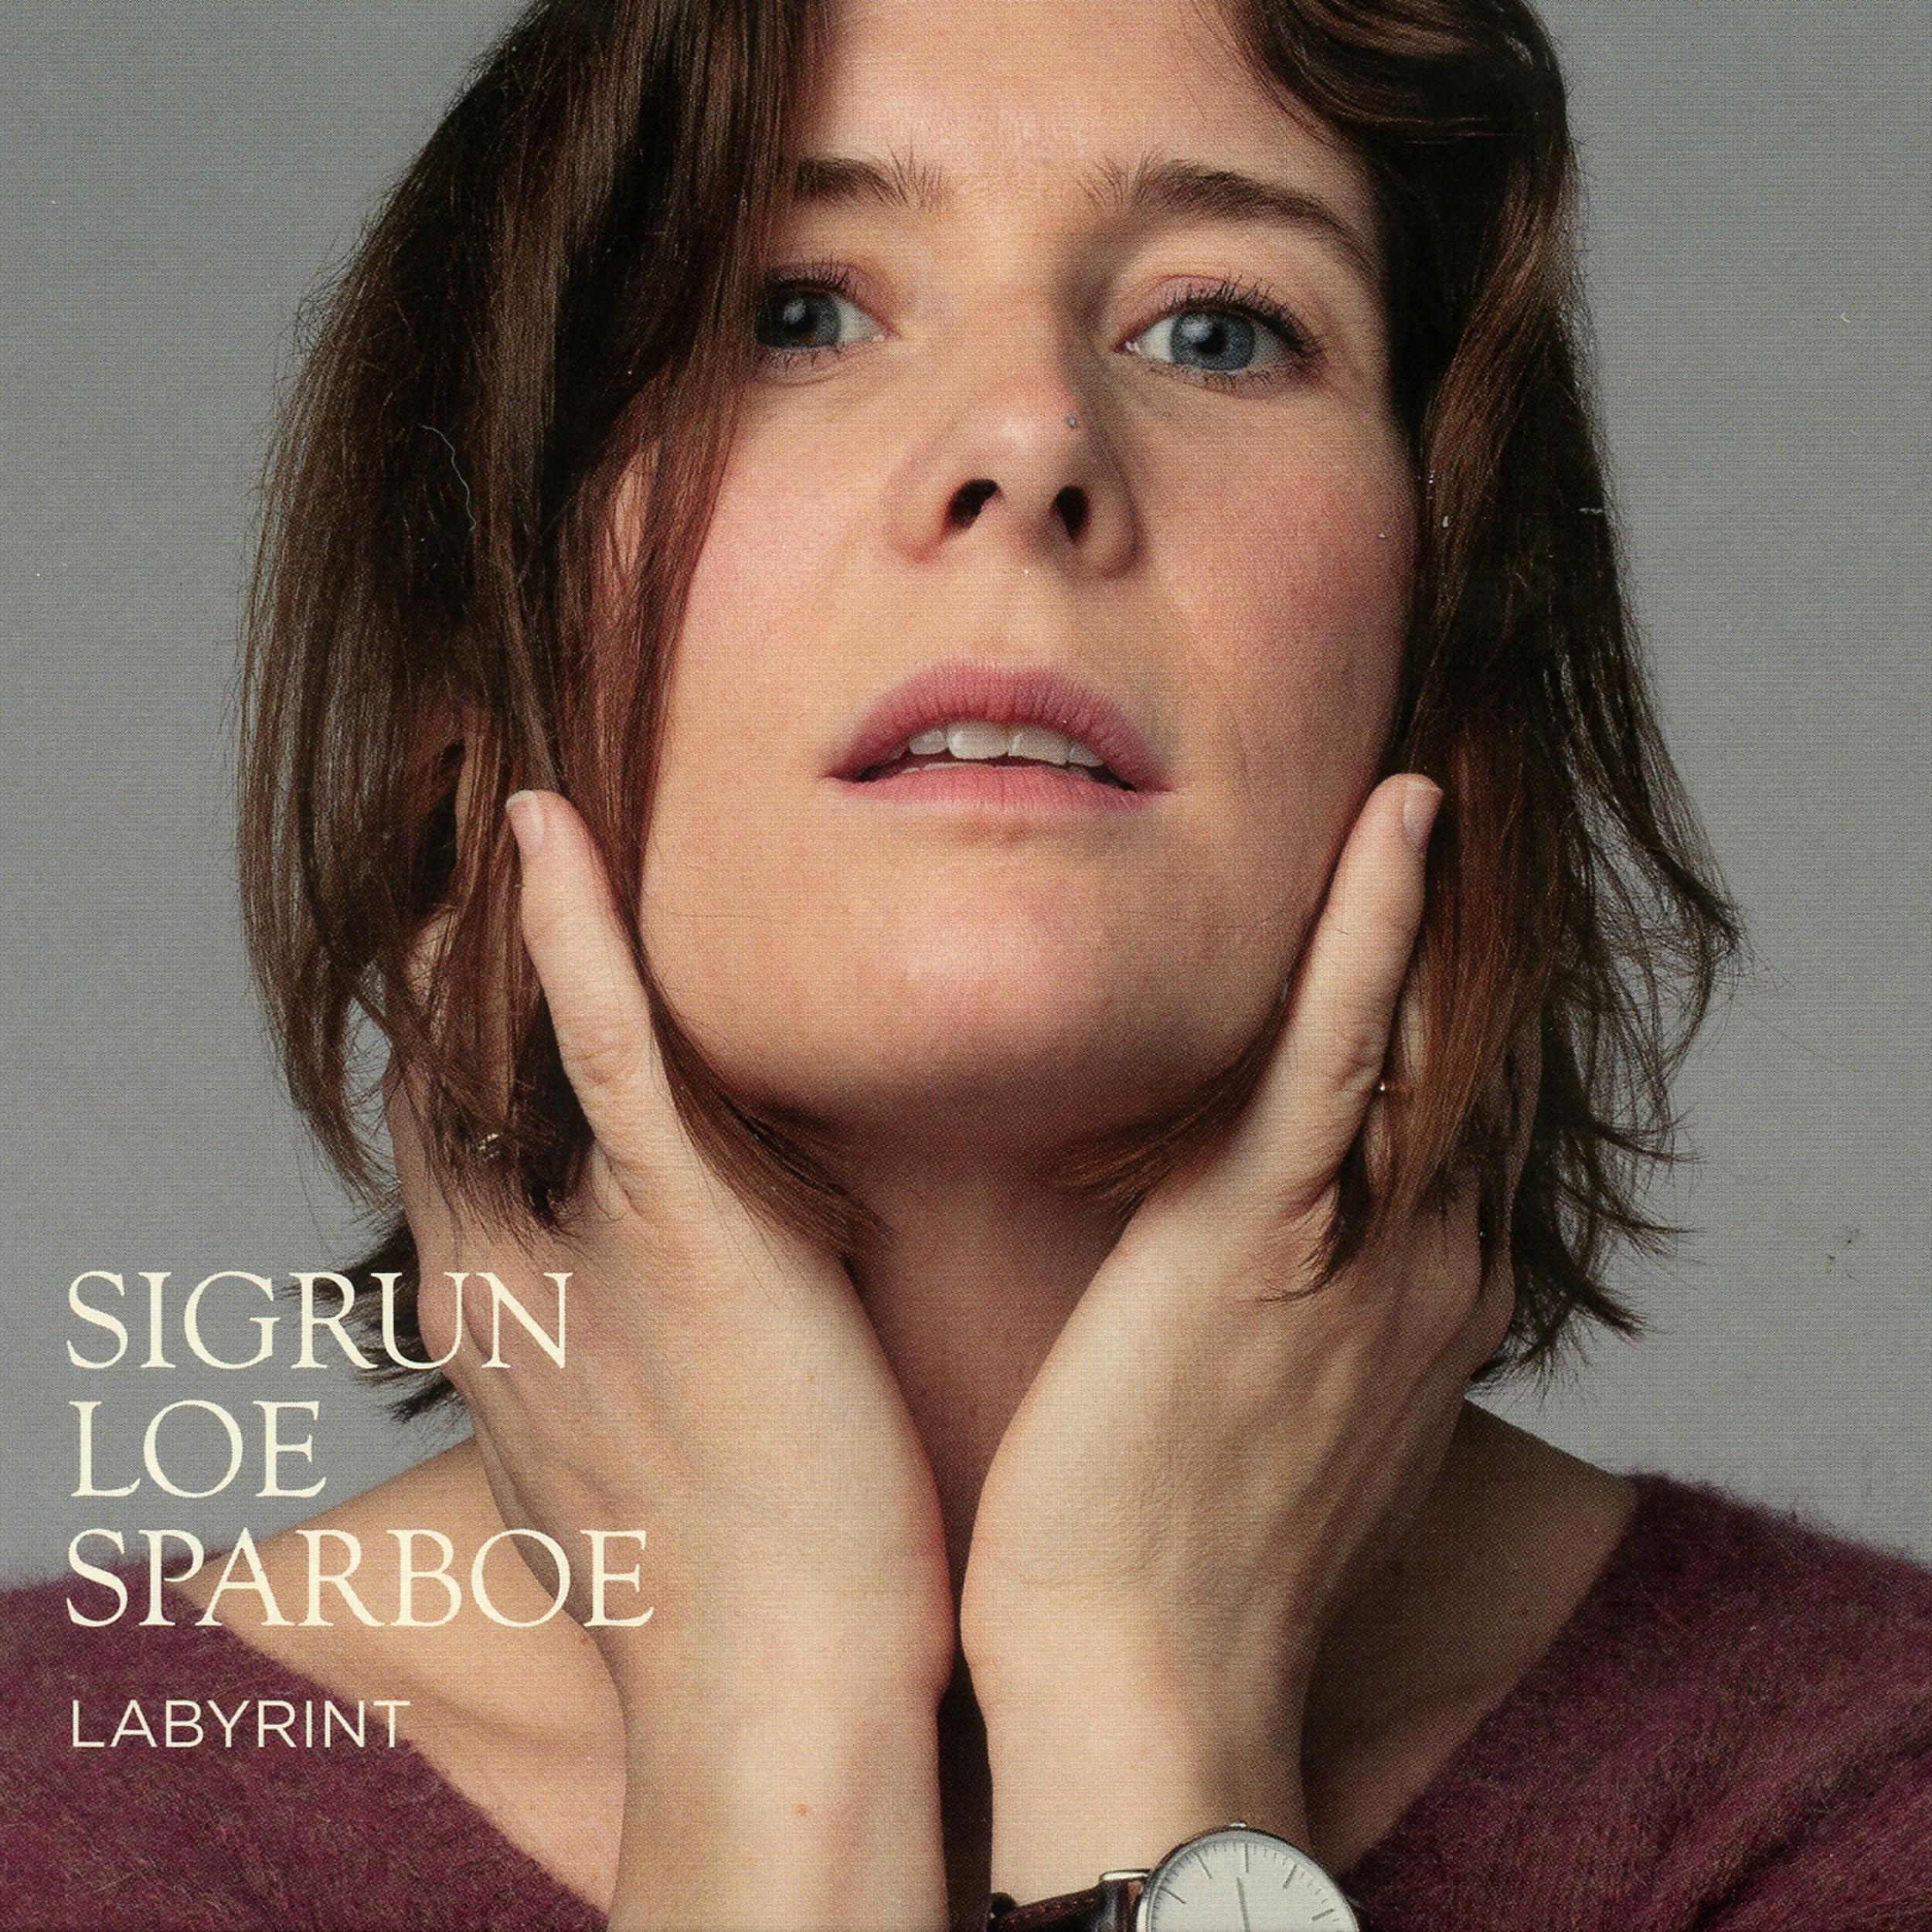 Sigrun Loe Sparboe - Labyrint.jpg